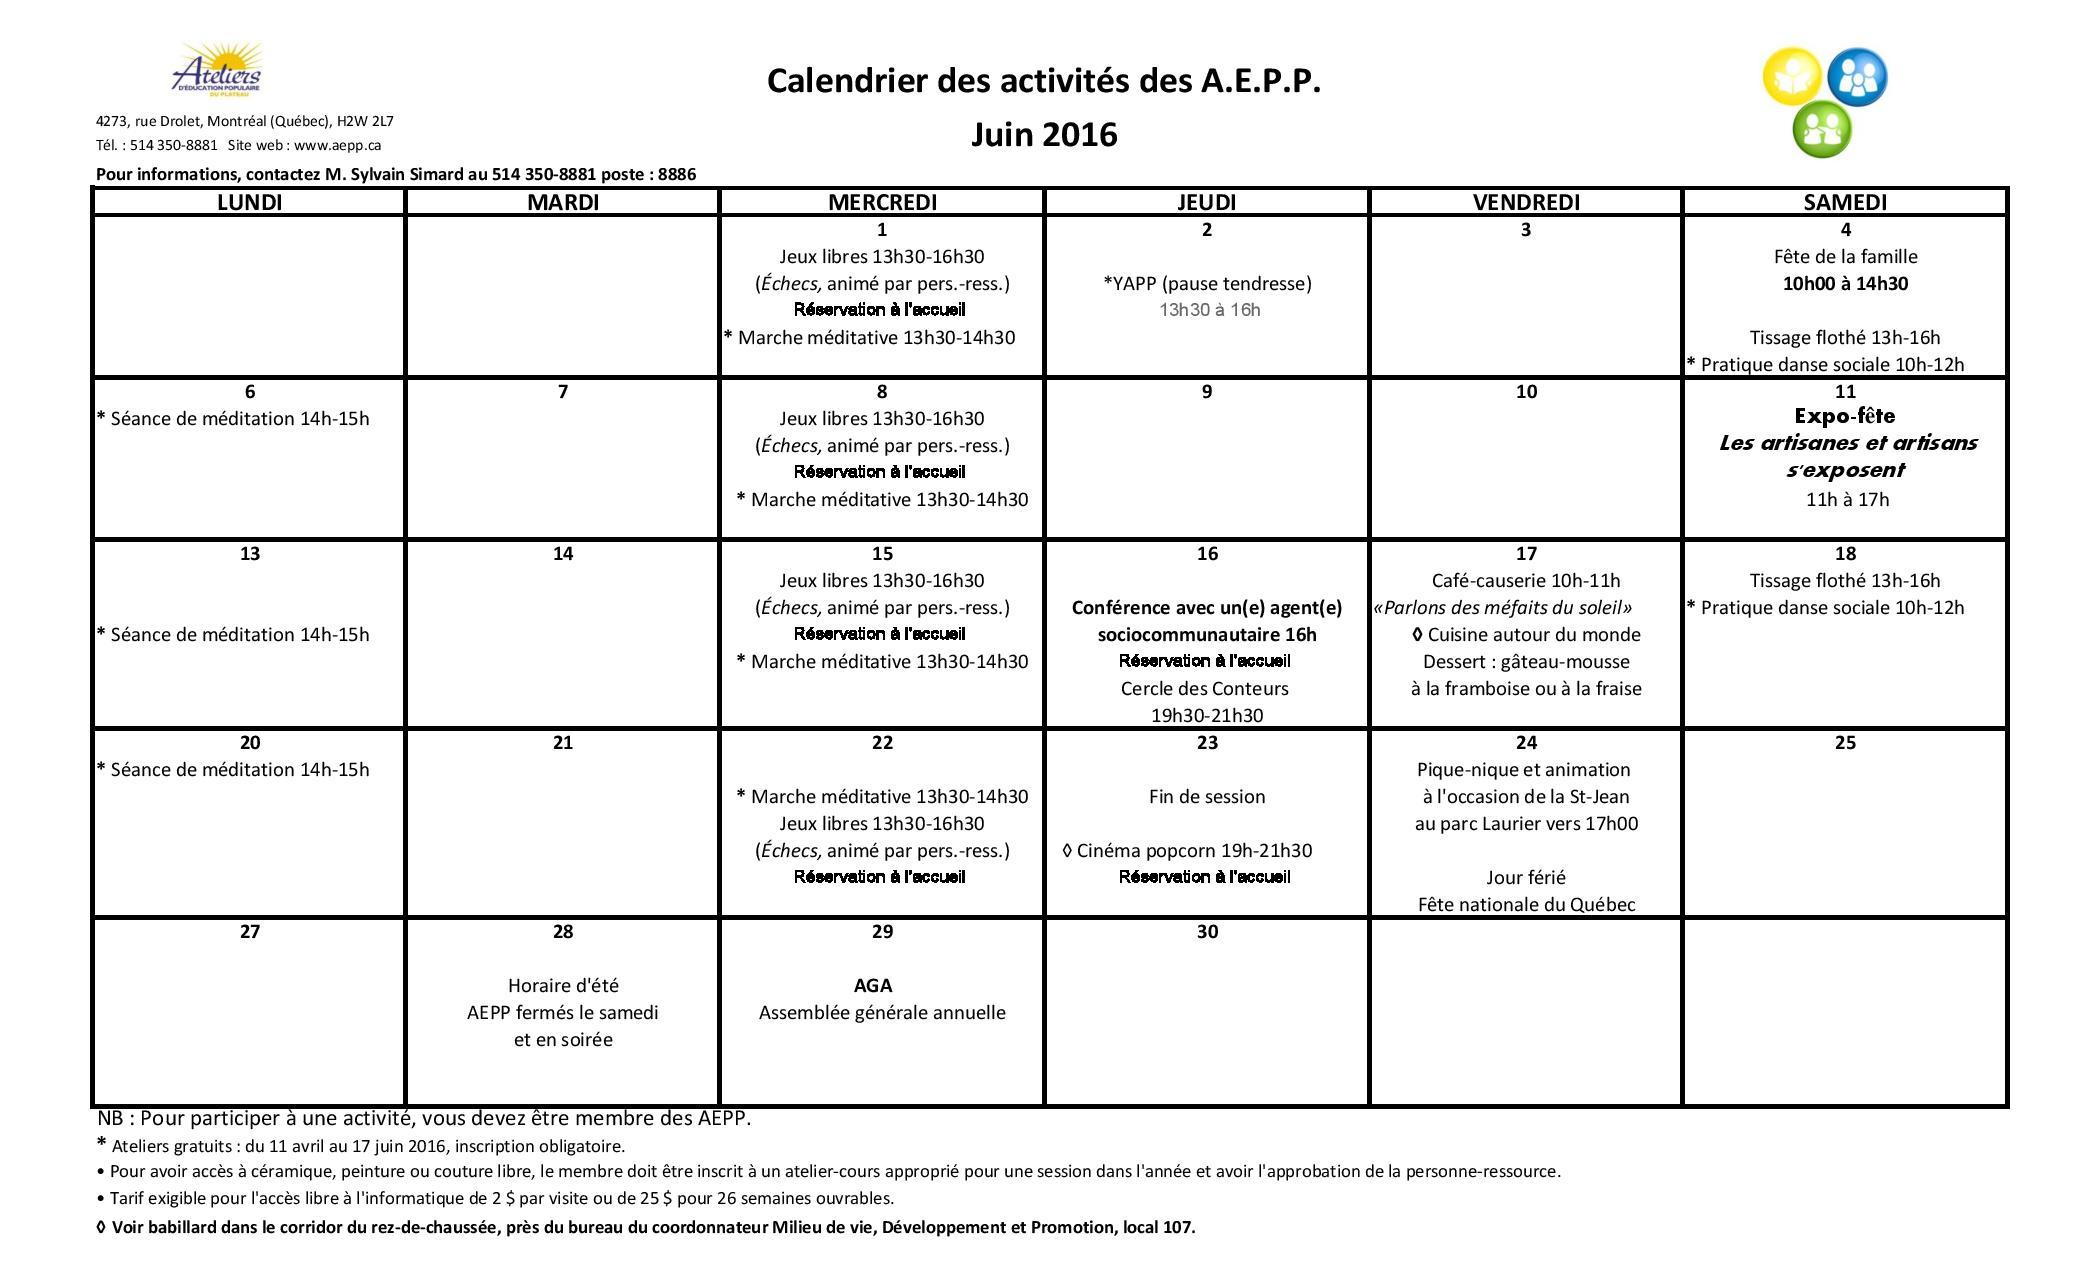 Calendrier d'activités – Septembre 2016 Copy Copy